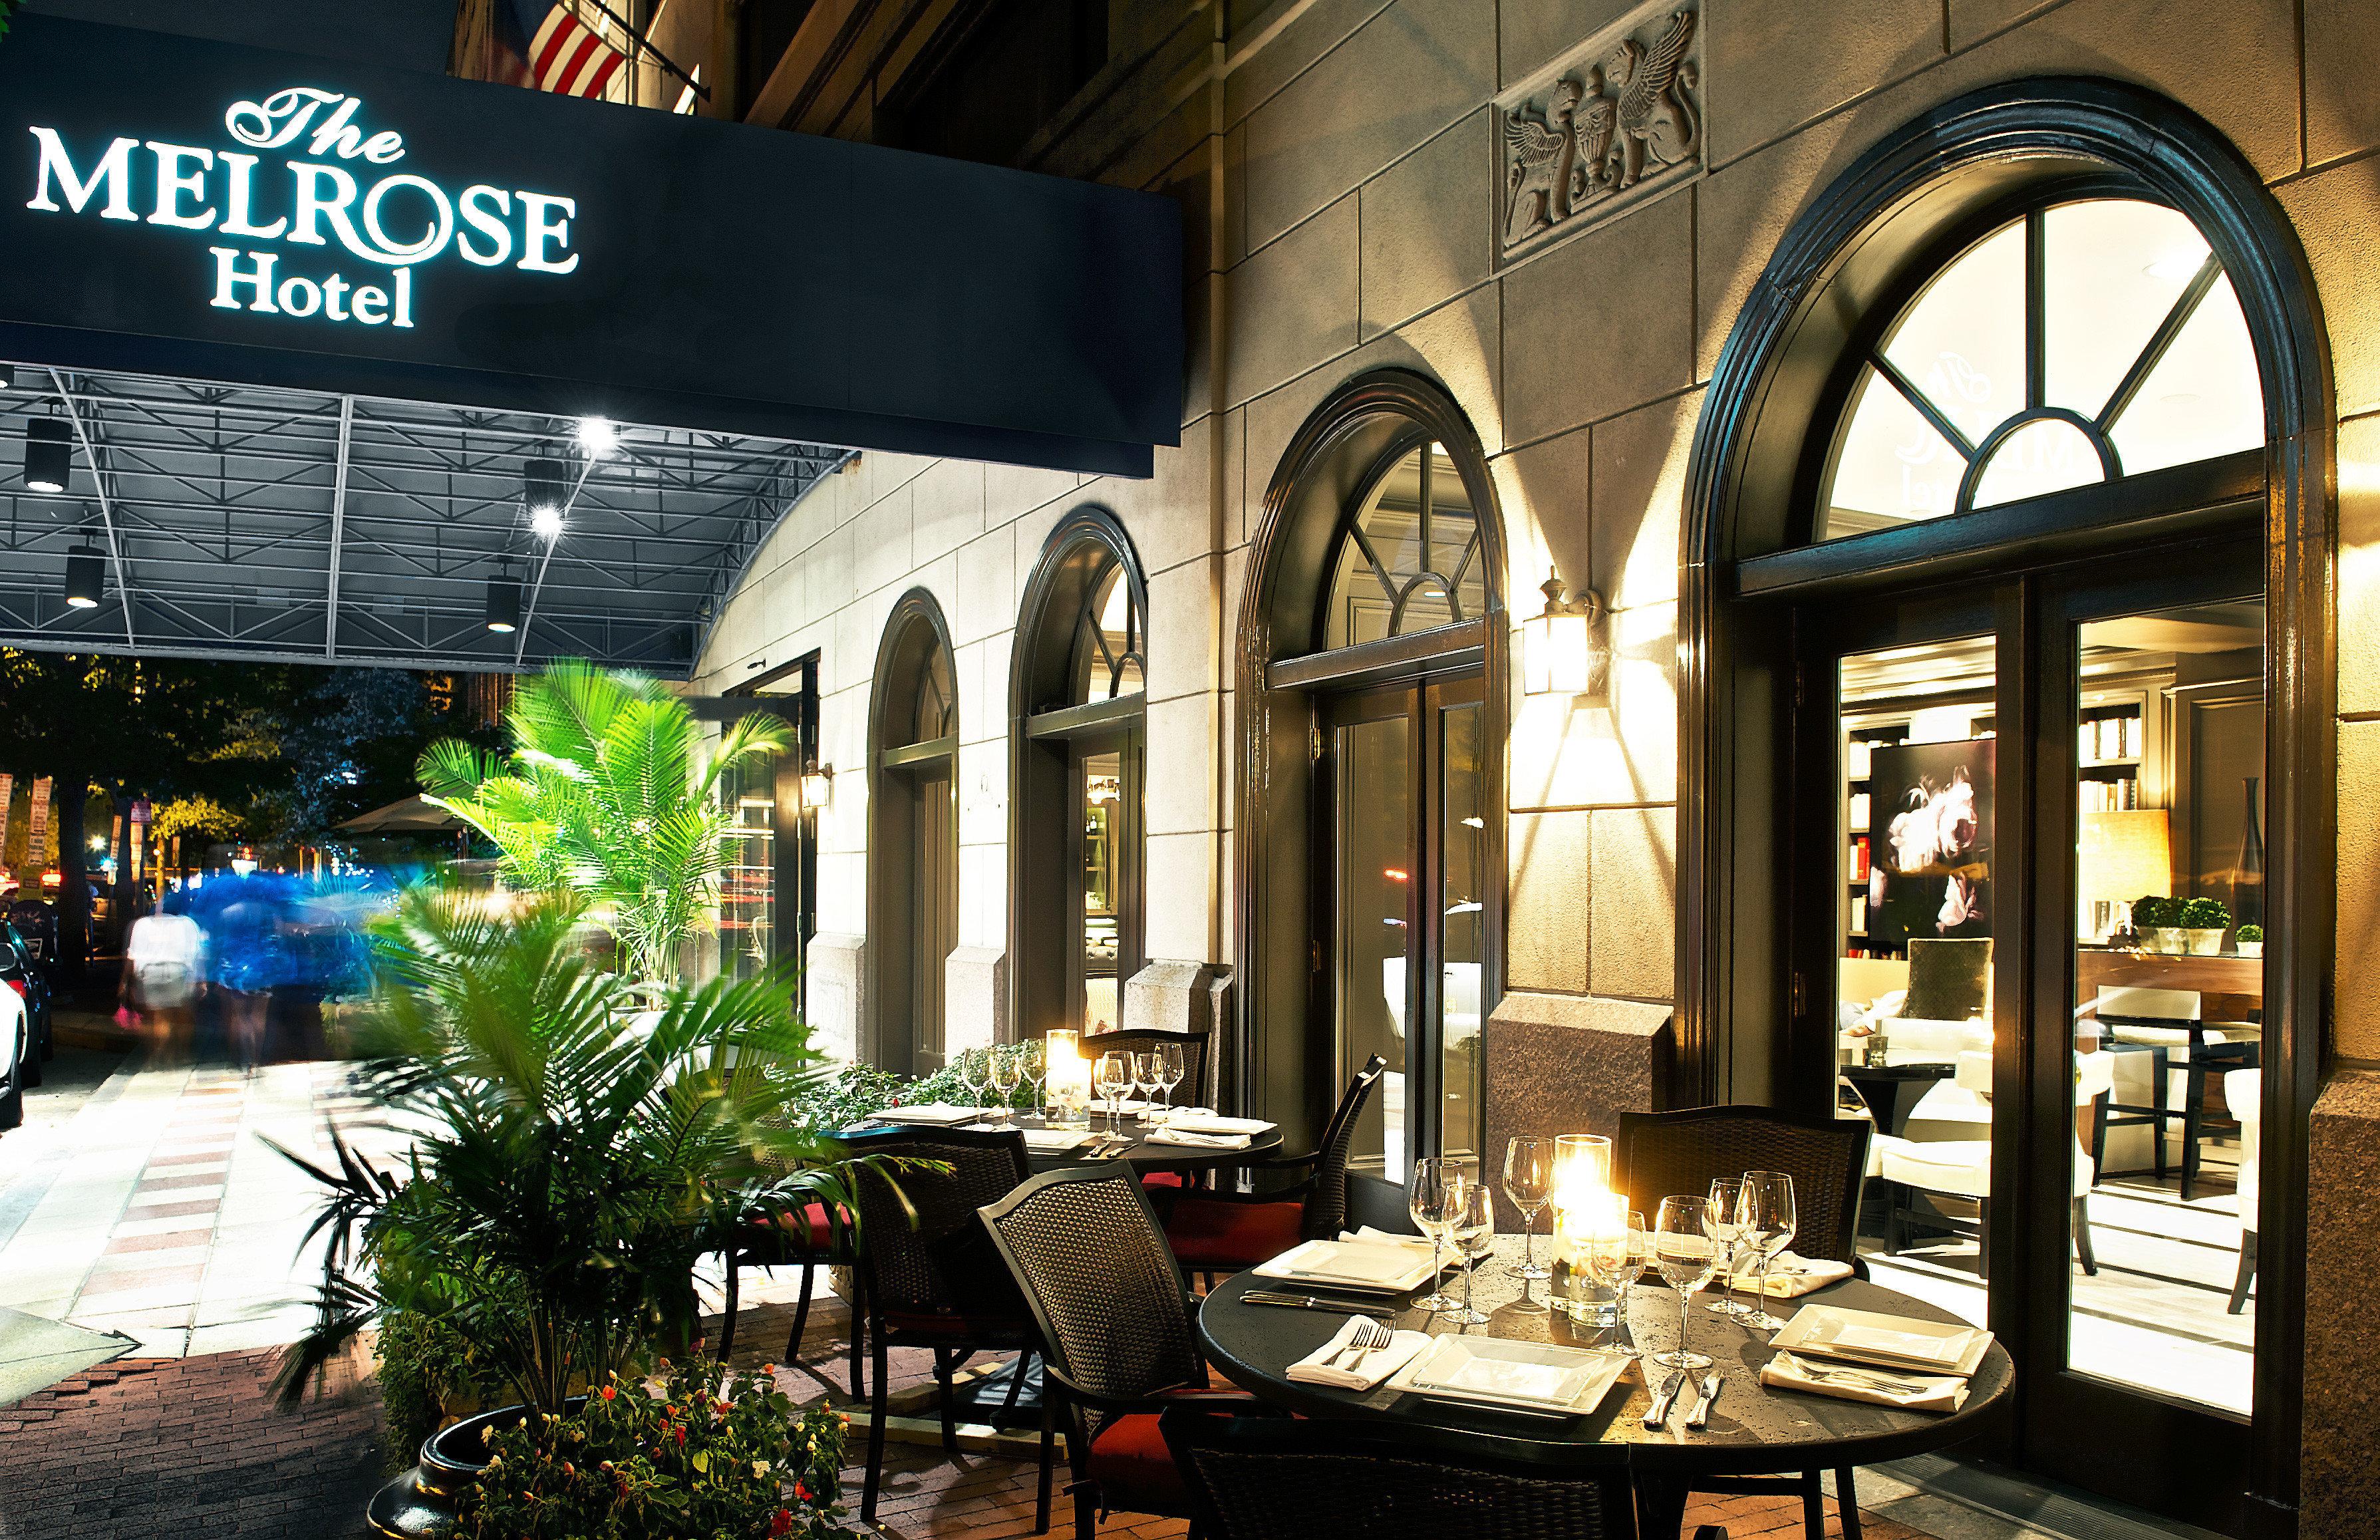 Boutique Budget City Dining Drink Eat Exterior Modern Patio restaurant